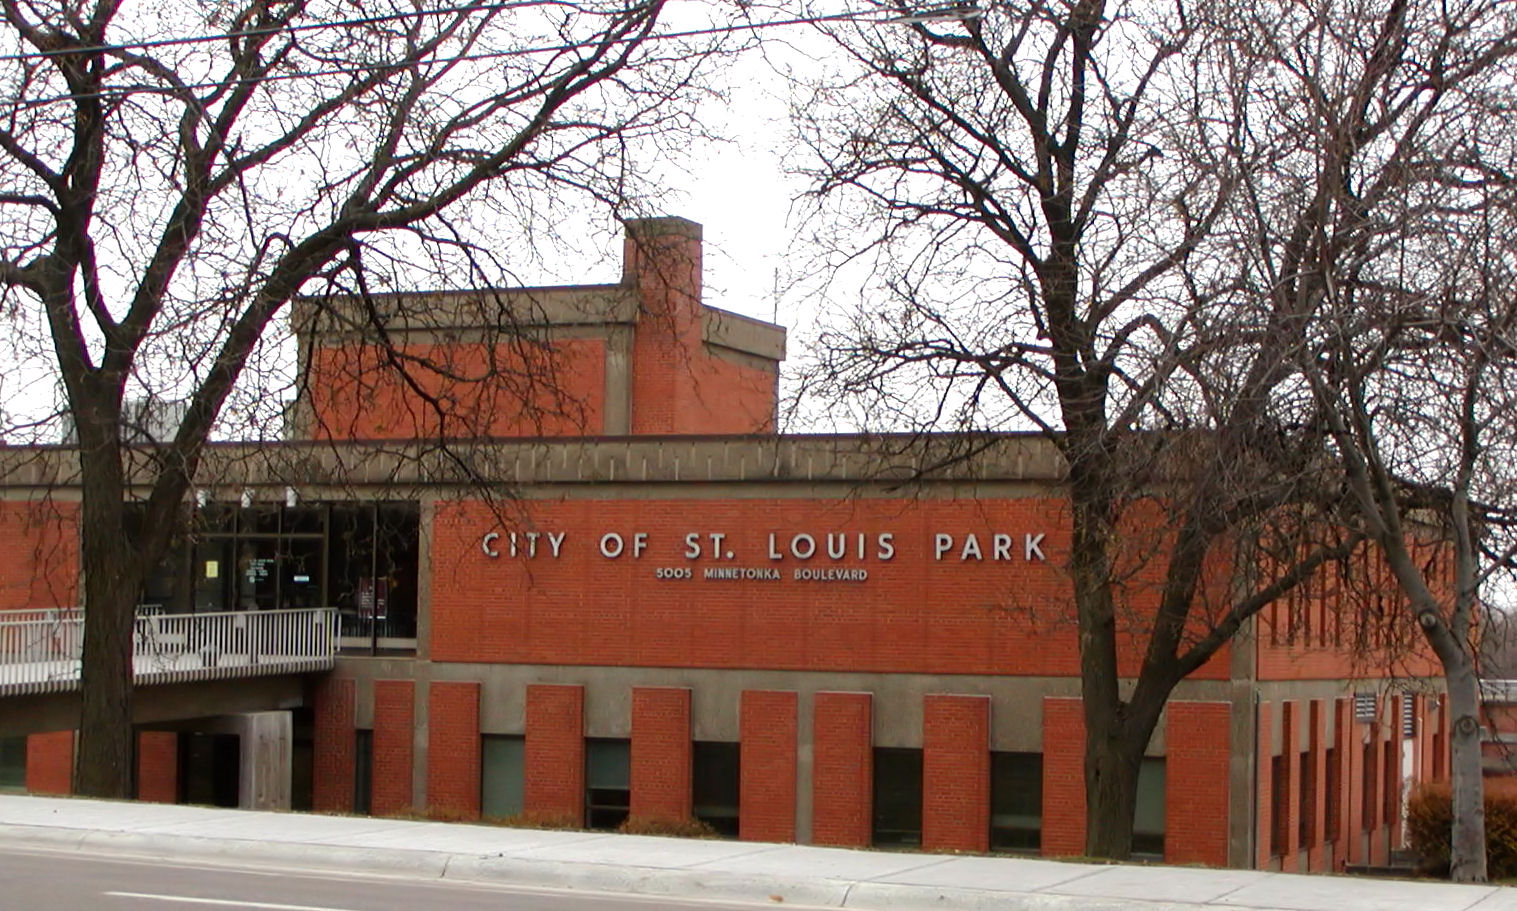 St. Louis Park (Minnesota)